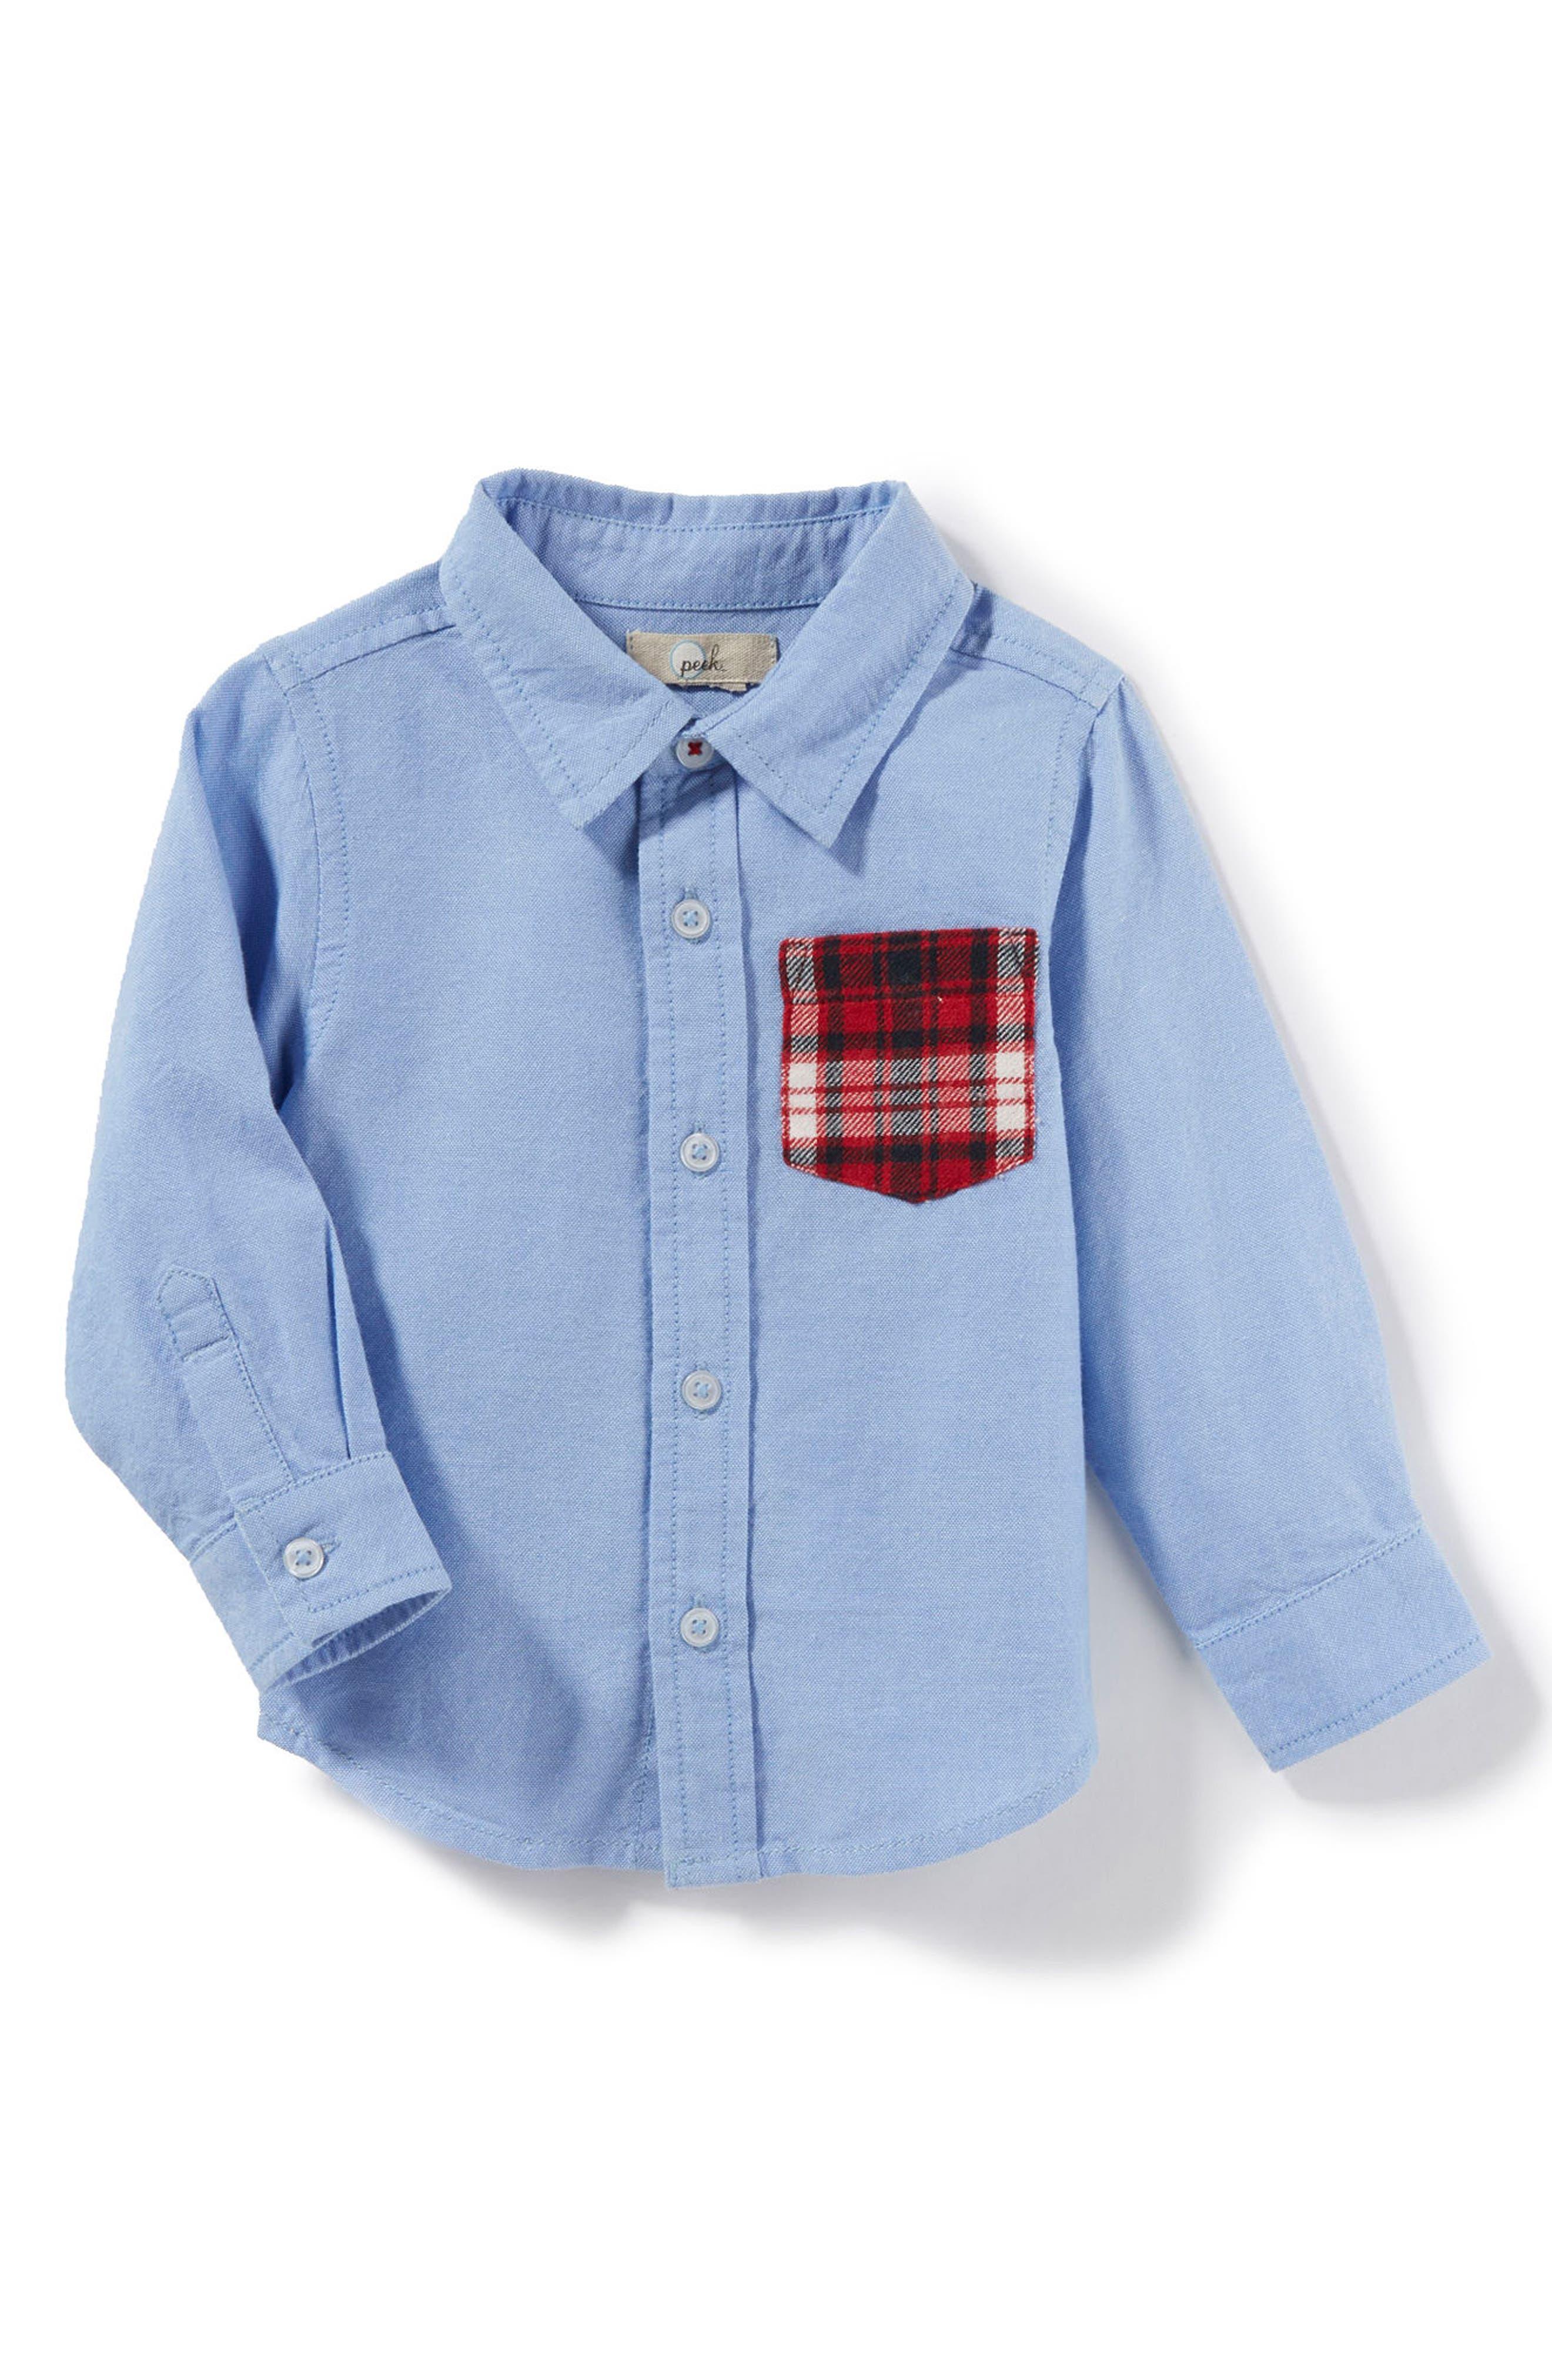 Alternate Image 1 Selected - Peek Johnny Oxford Shirt (Baby Boys)